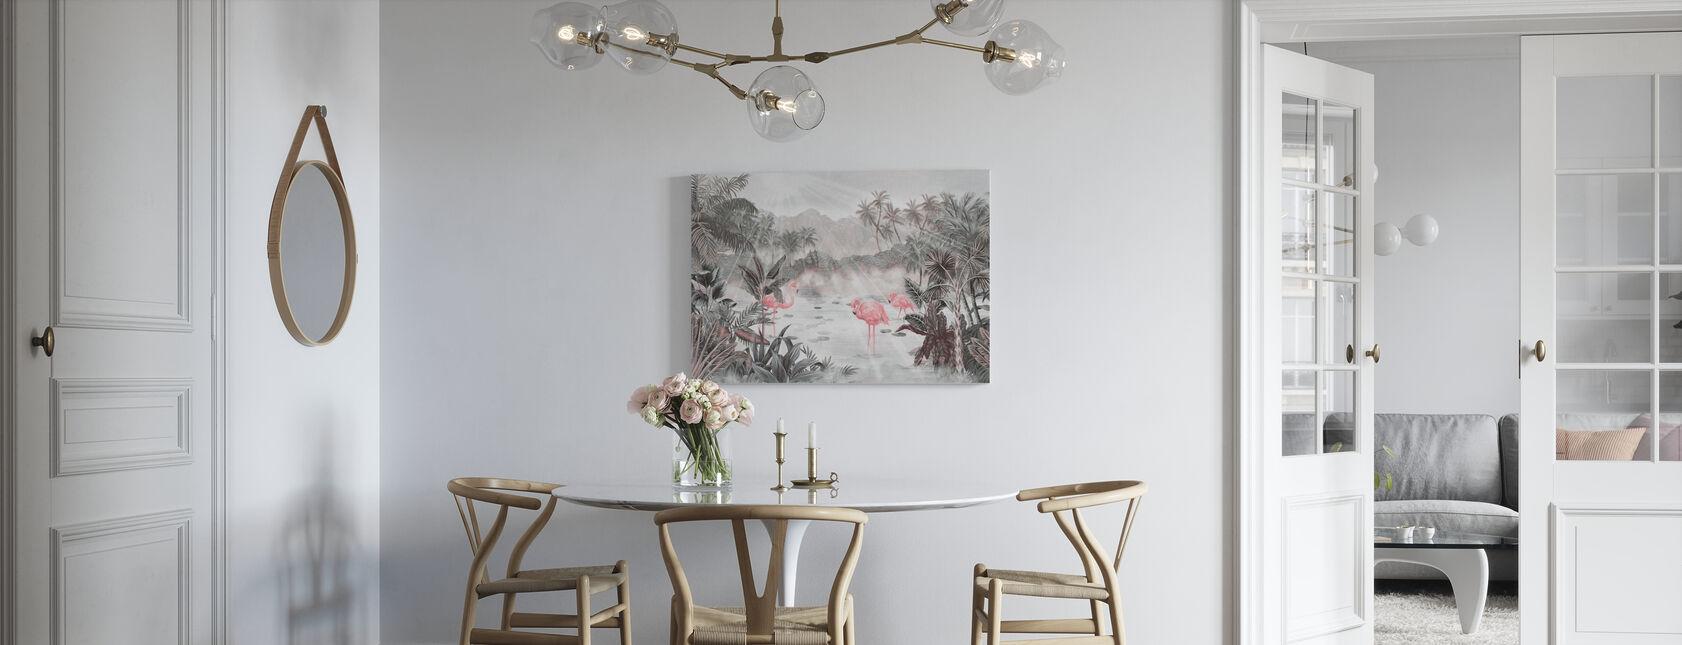 Flamingo essä - Pärla - Canvastavla - Kök